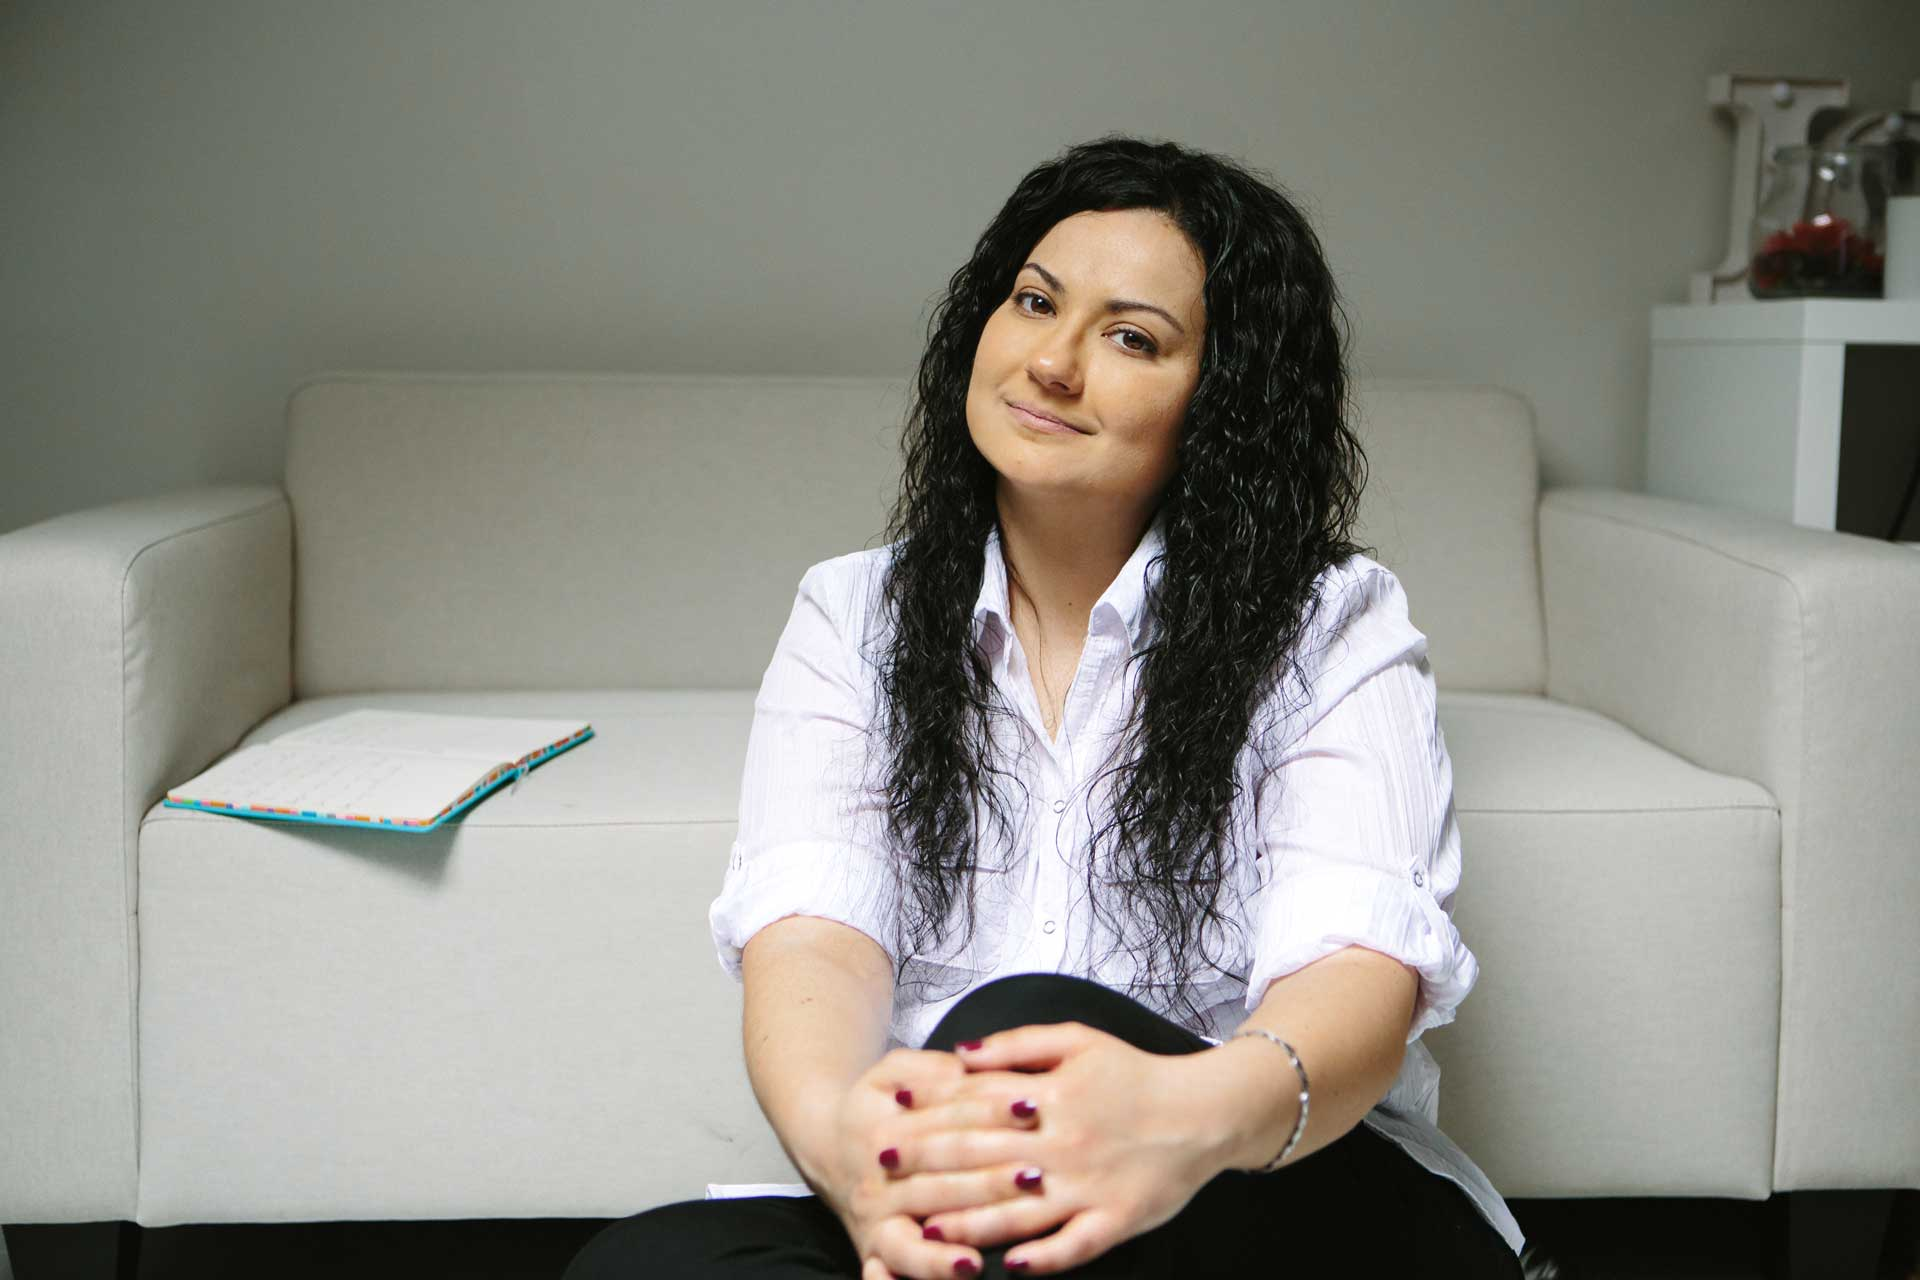 Olga-sentada-sofa